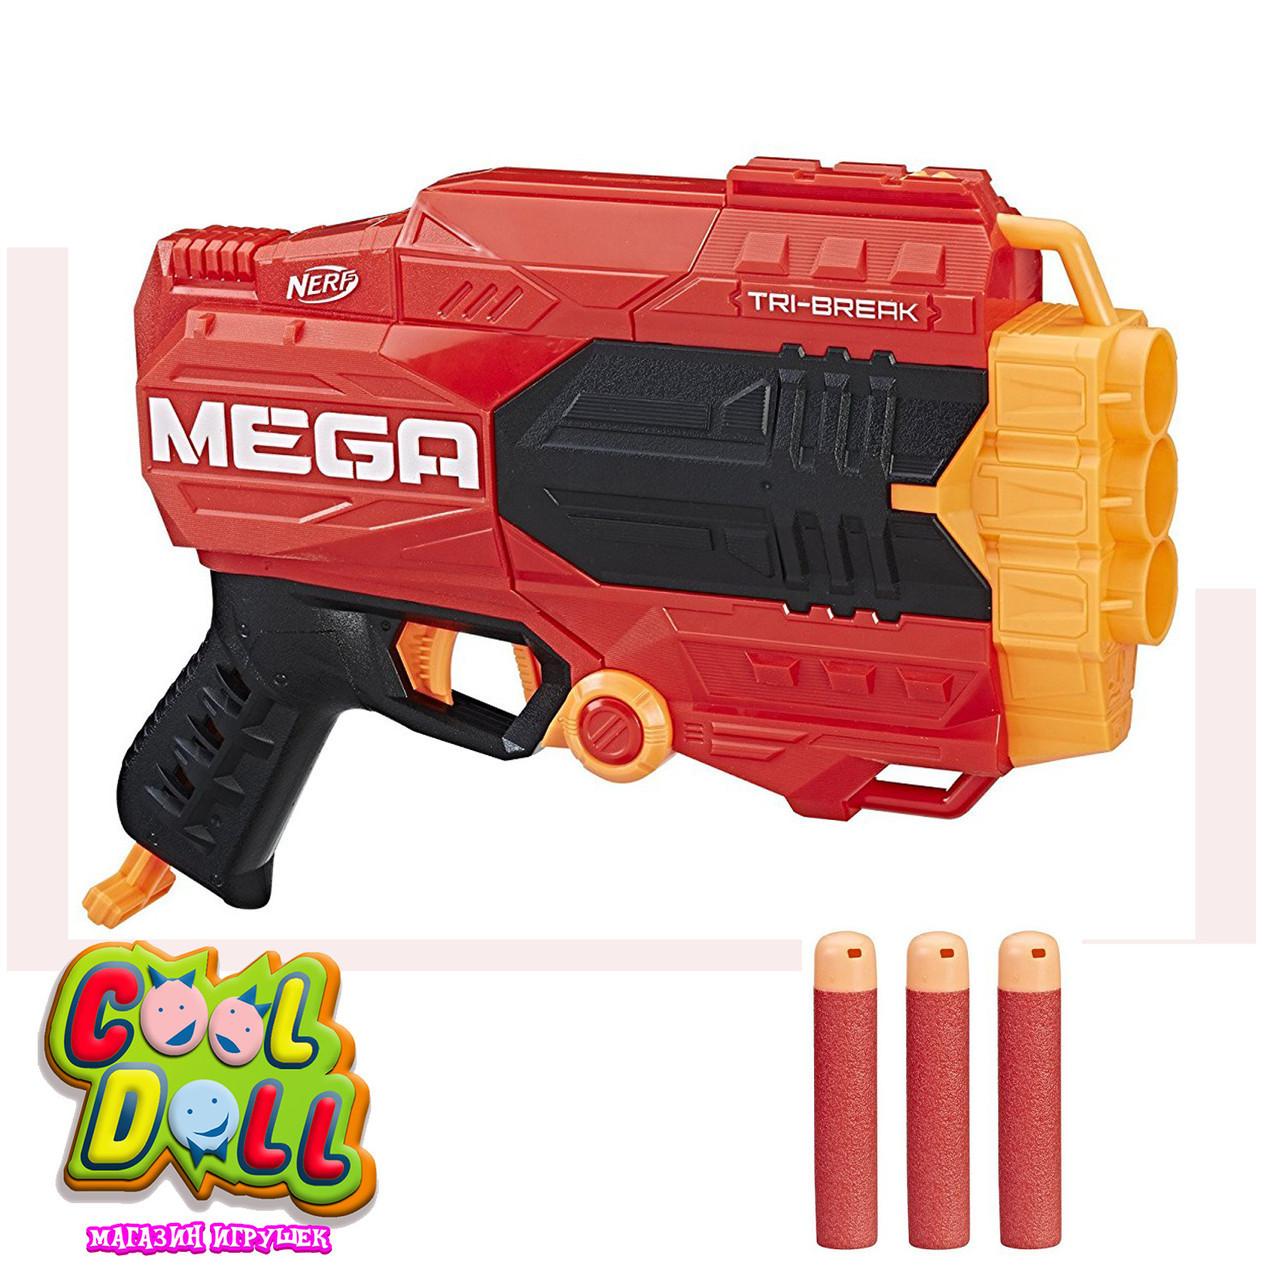 Бластер Нёрф Мега Три-Брейк Nerf N-Strike Mega Tri-Break